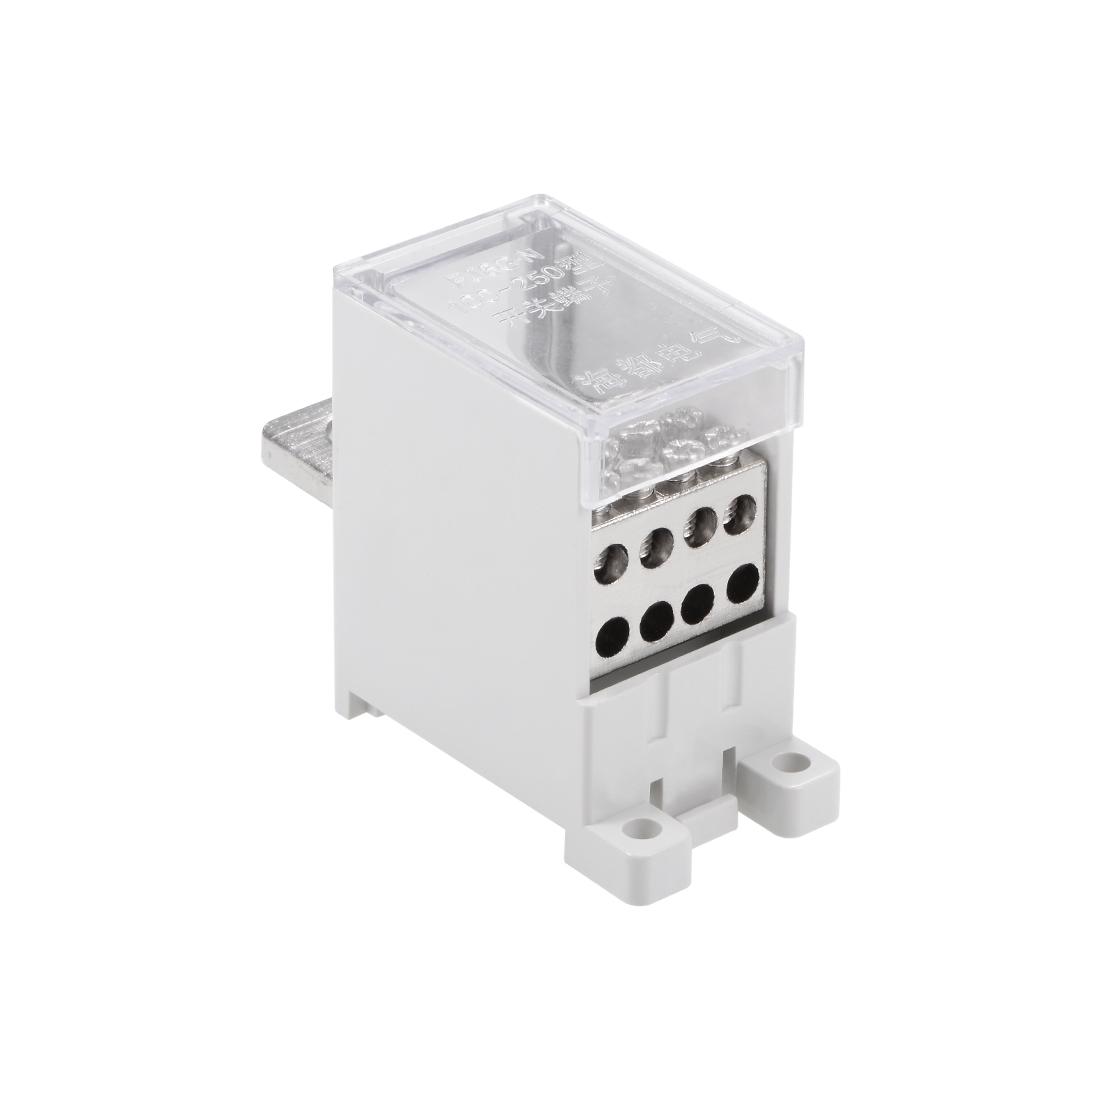 1 In 8 Out DIN Rail Terminal Blocks 250A Max Input Distribution Block